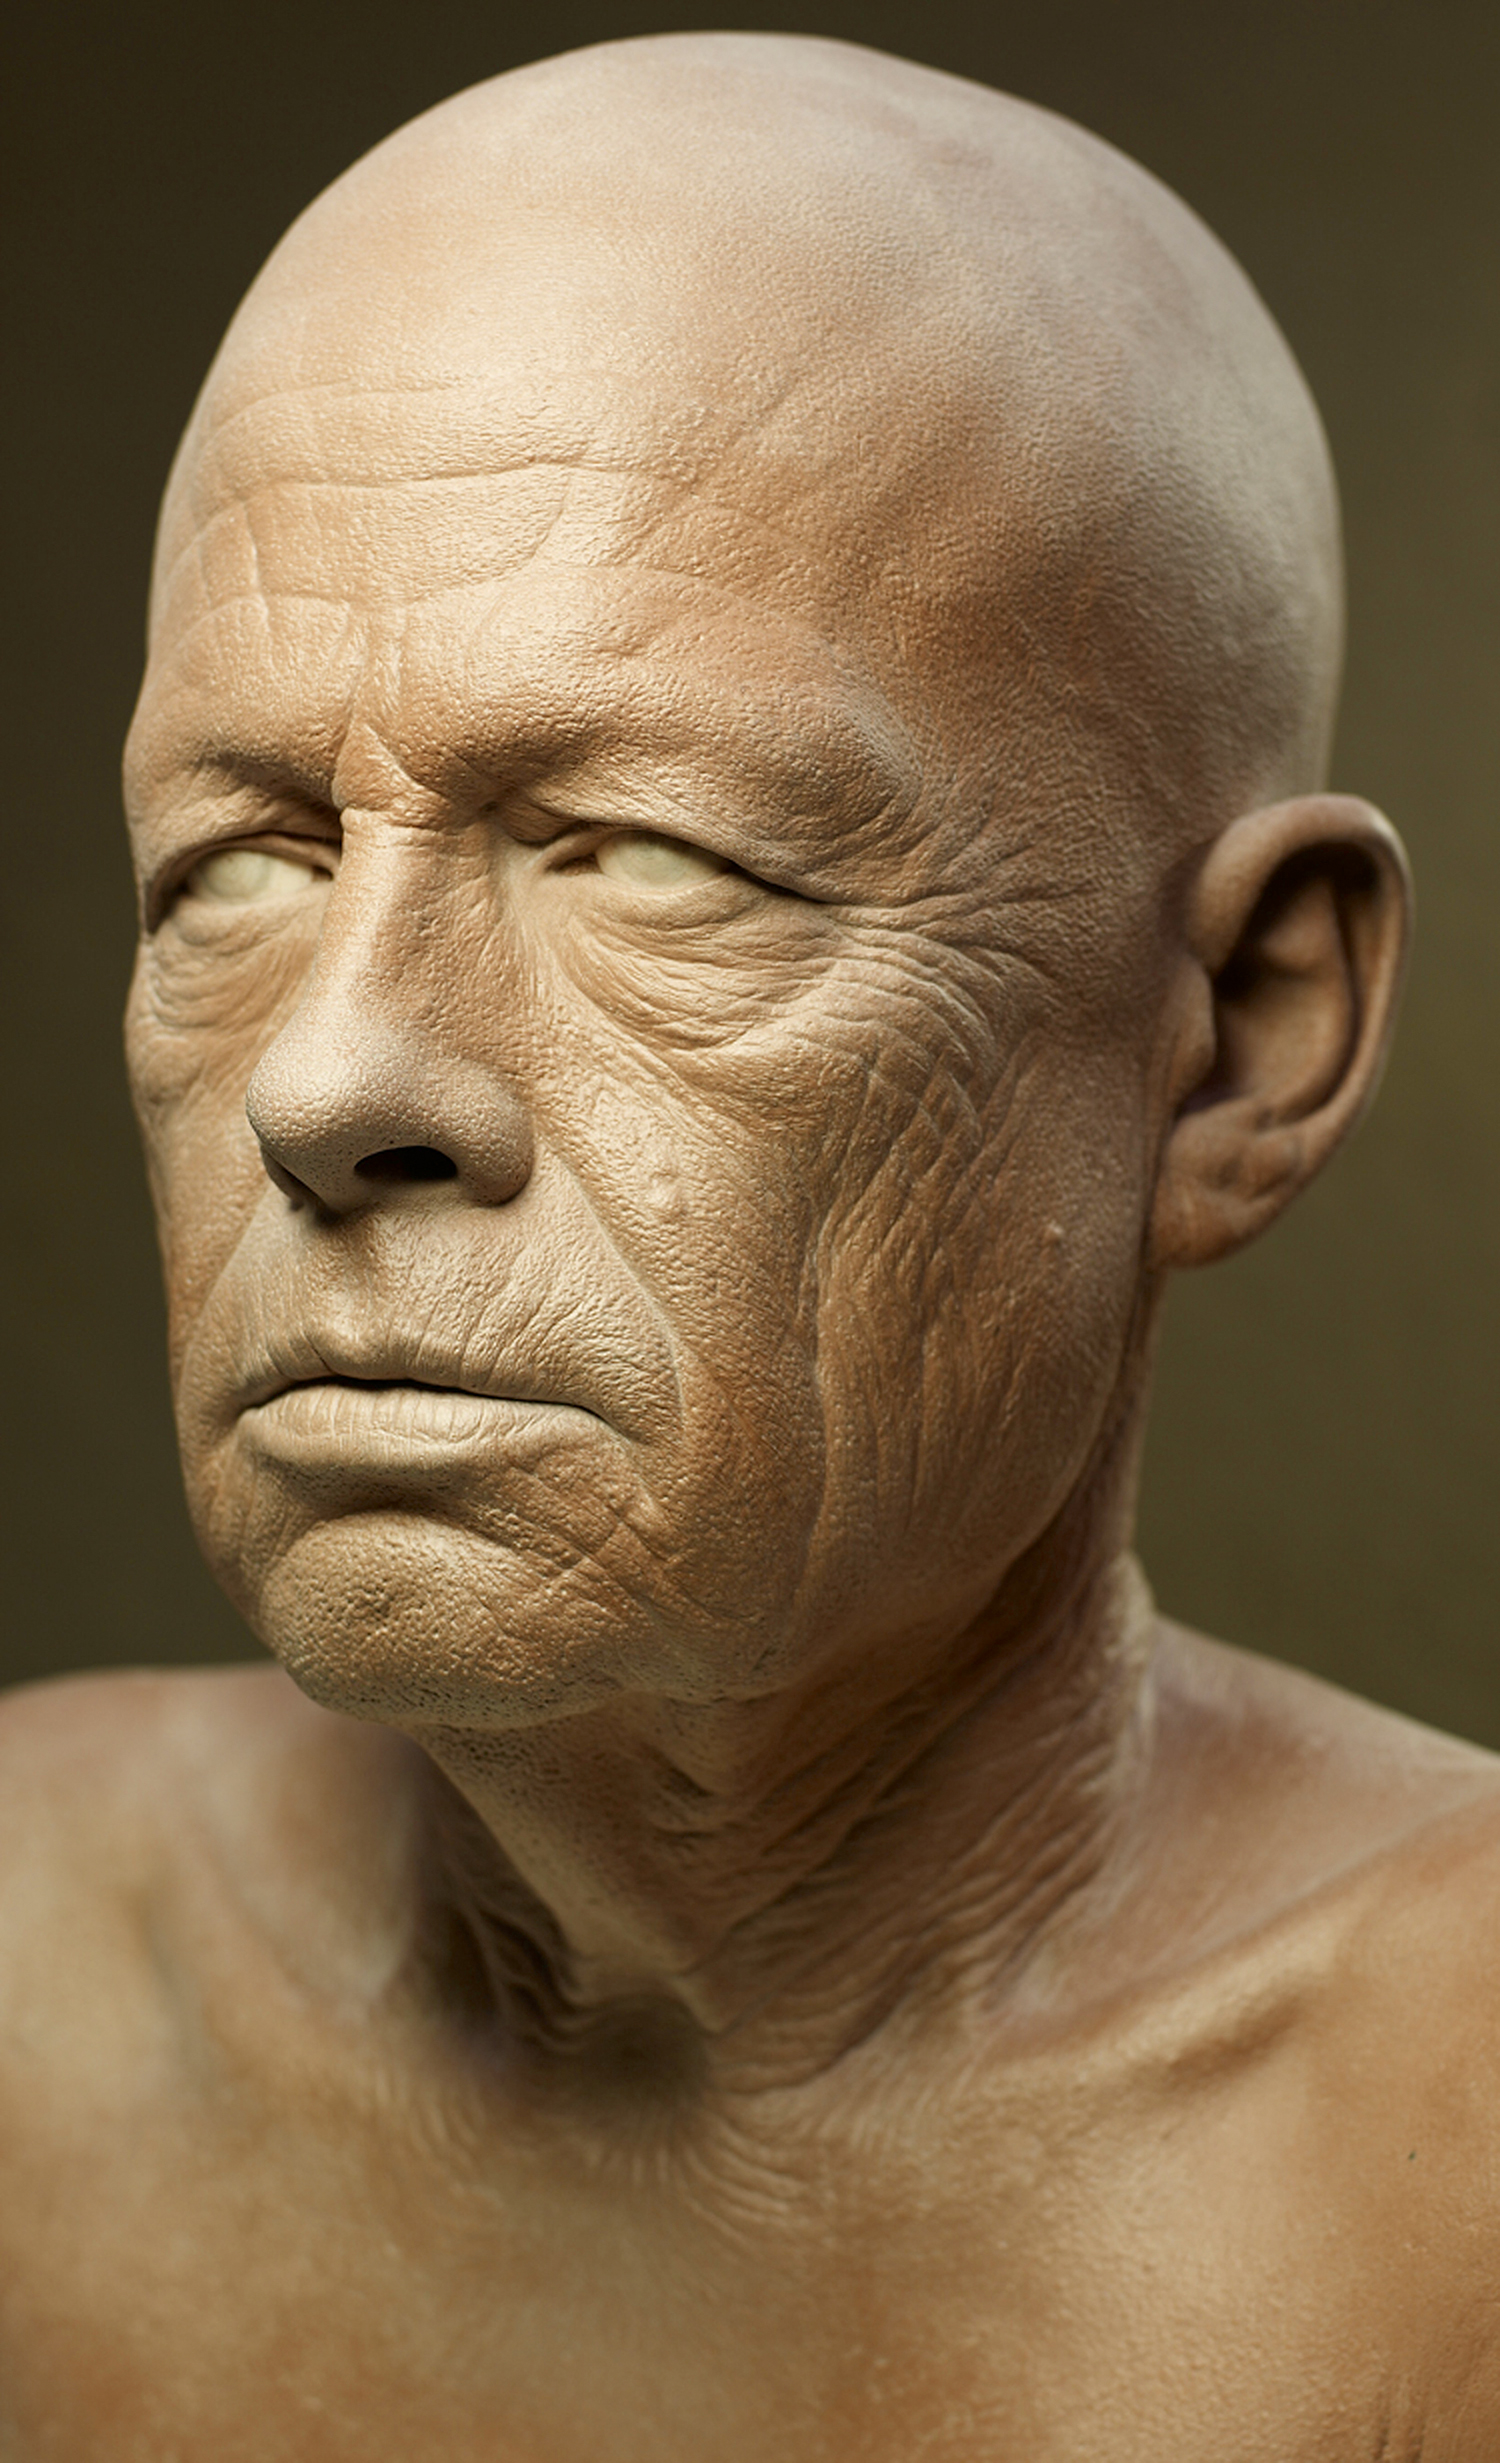 headsculpture copy.jpg